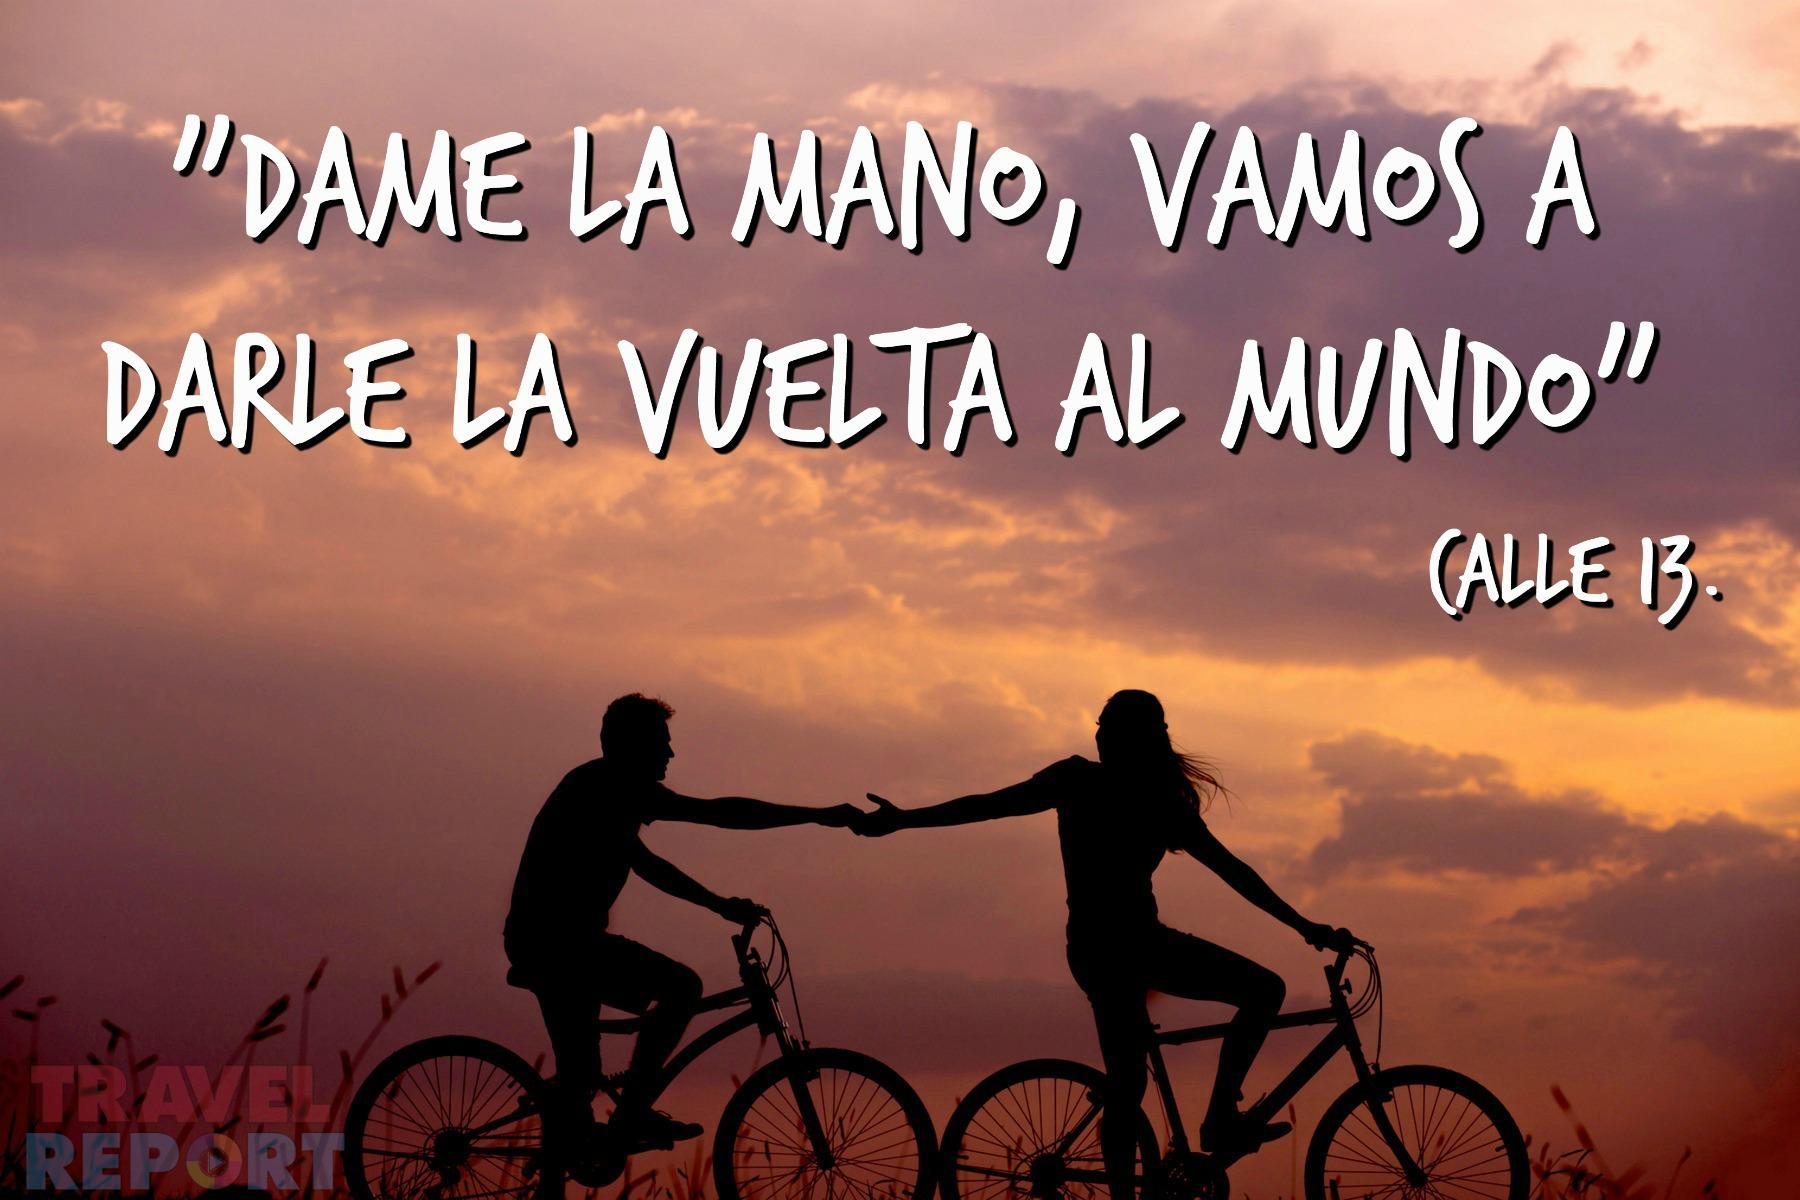 frases-amor-viajes-viajeros-bicicleta